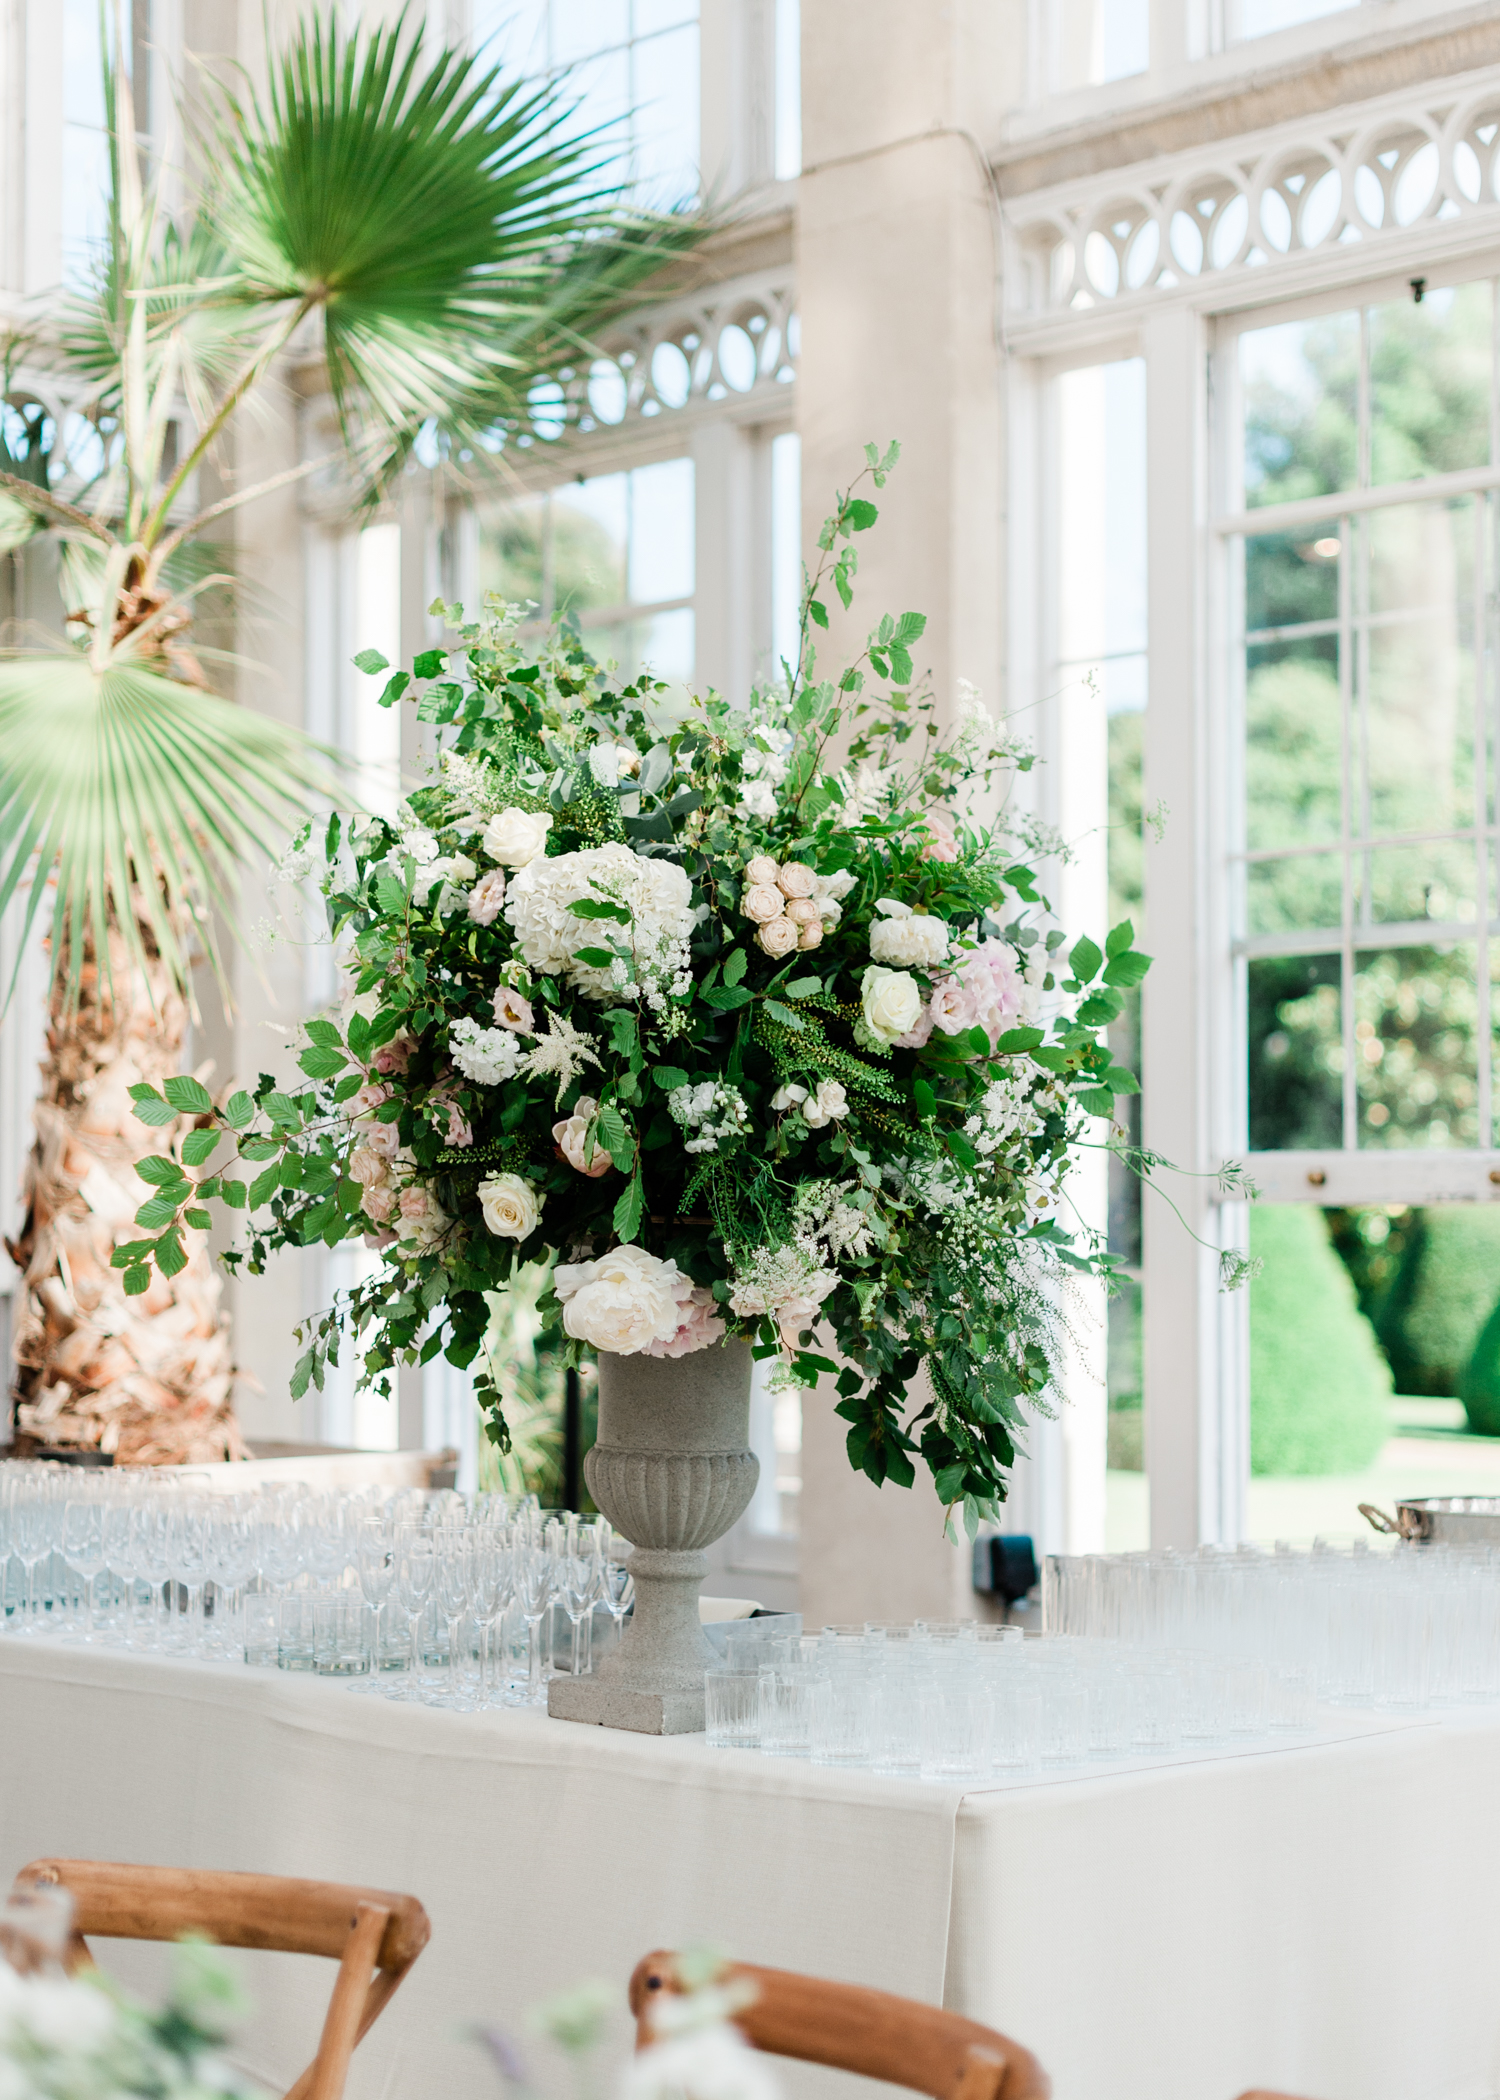 Littleton-Rose-Syon-House-London-Wedding-Planner-bar.jpg